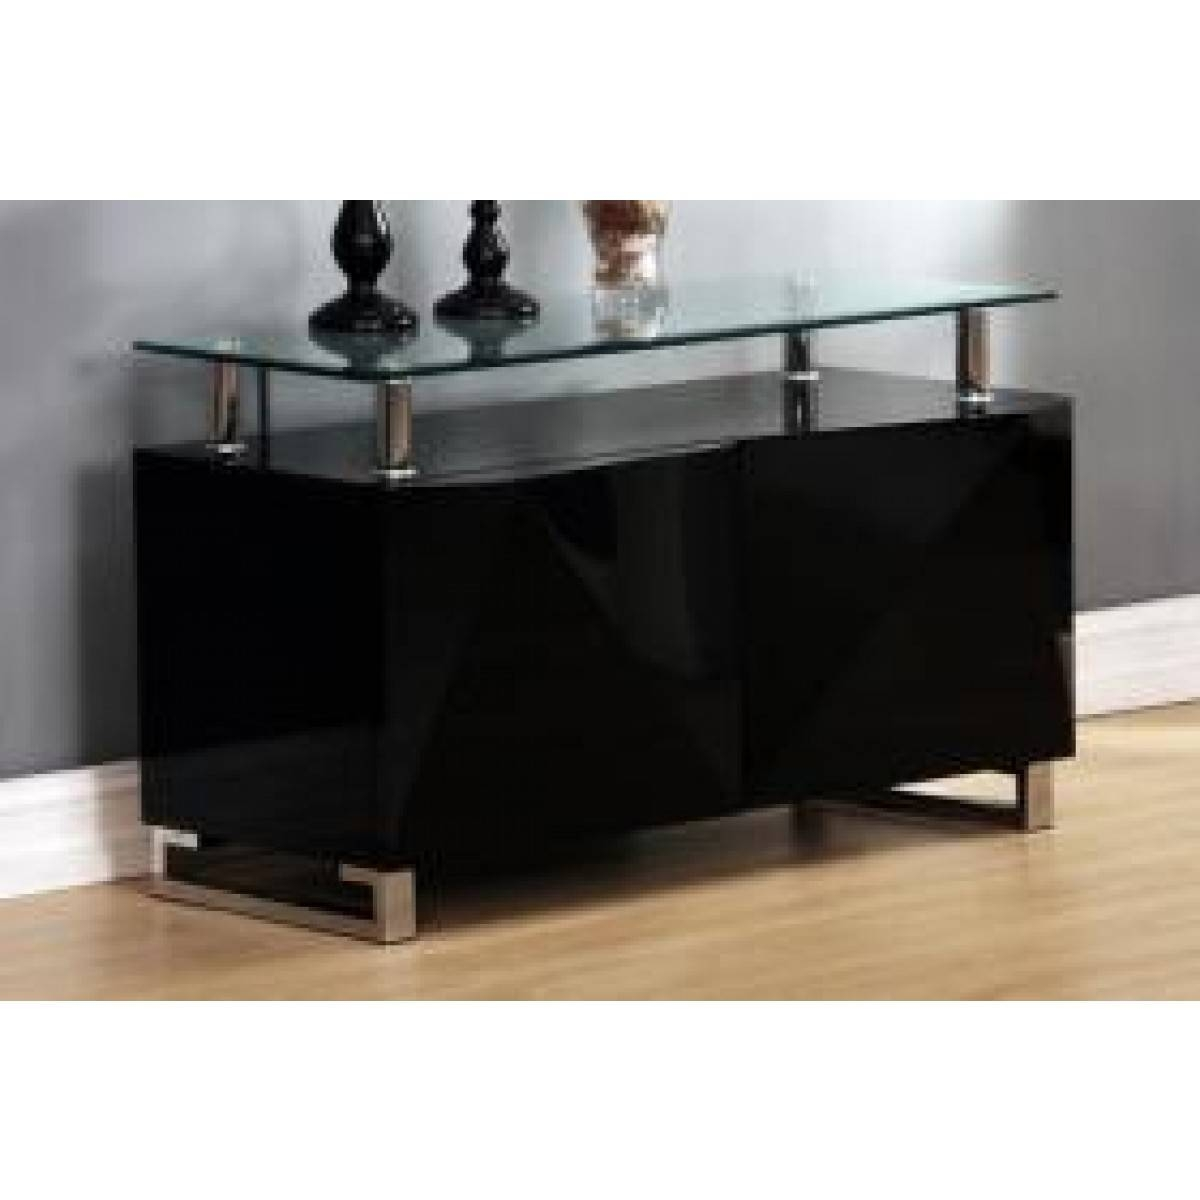 Rowley Black High Gloss Sideboard 2 Doors – Sideboards And With Regard To Black High Gloss Sideboard (#17 of 20)